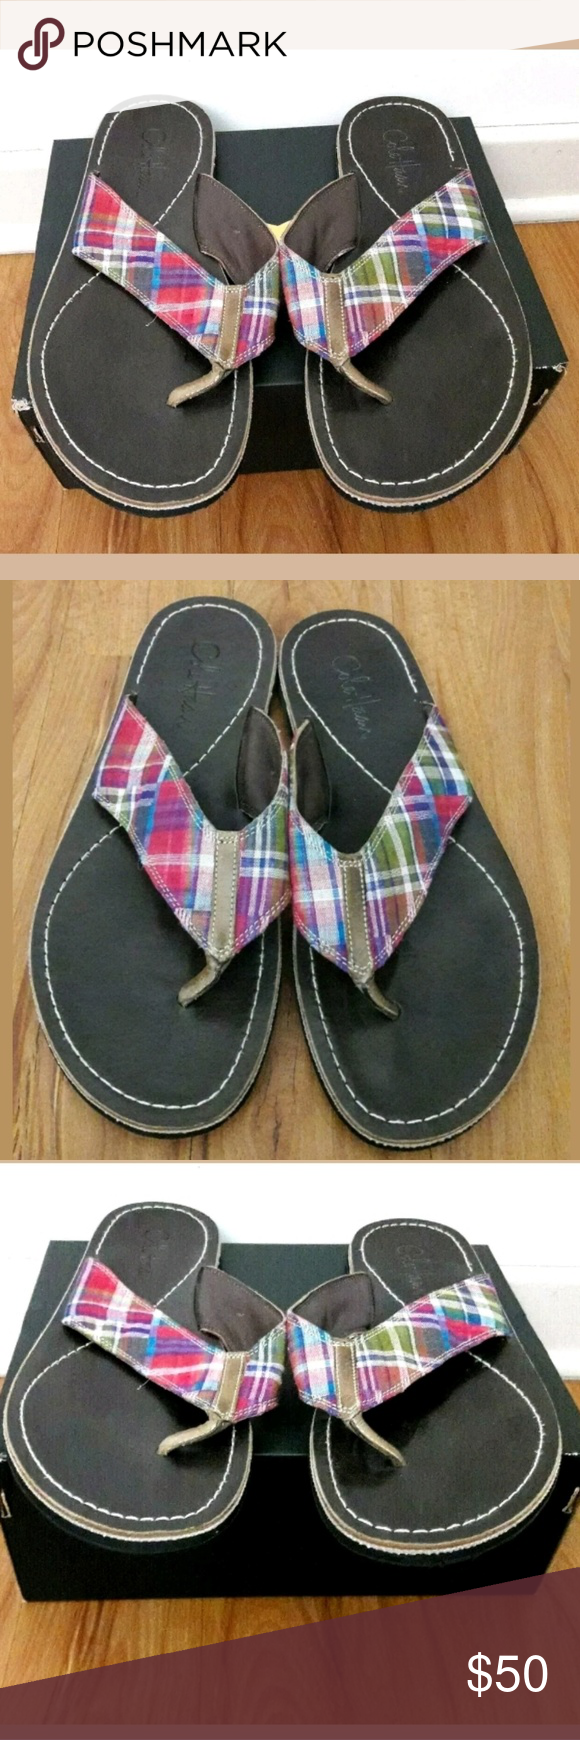 515ecd8e1b4c Spotted while shopping on Poshmark  Cole Haan Mens Thong Sandals Flip Flops!   poshmark